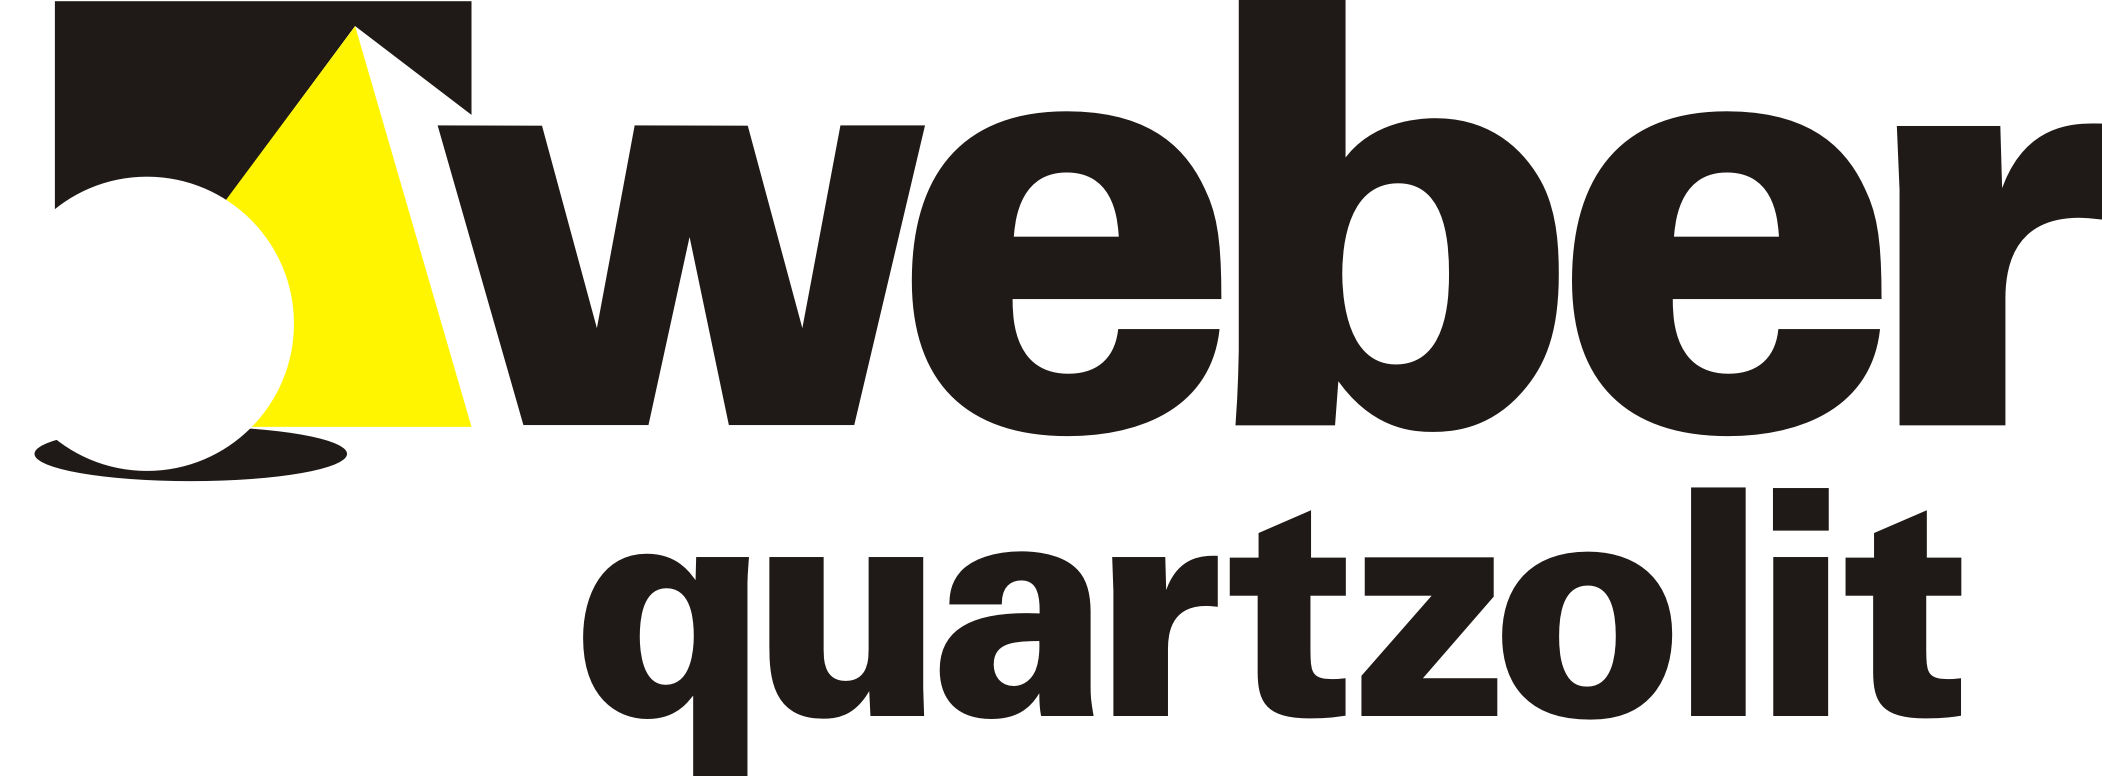 logo-weber-quartzolit_semfio1